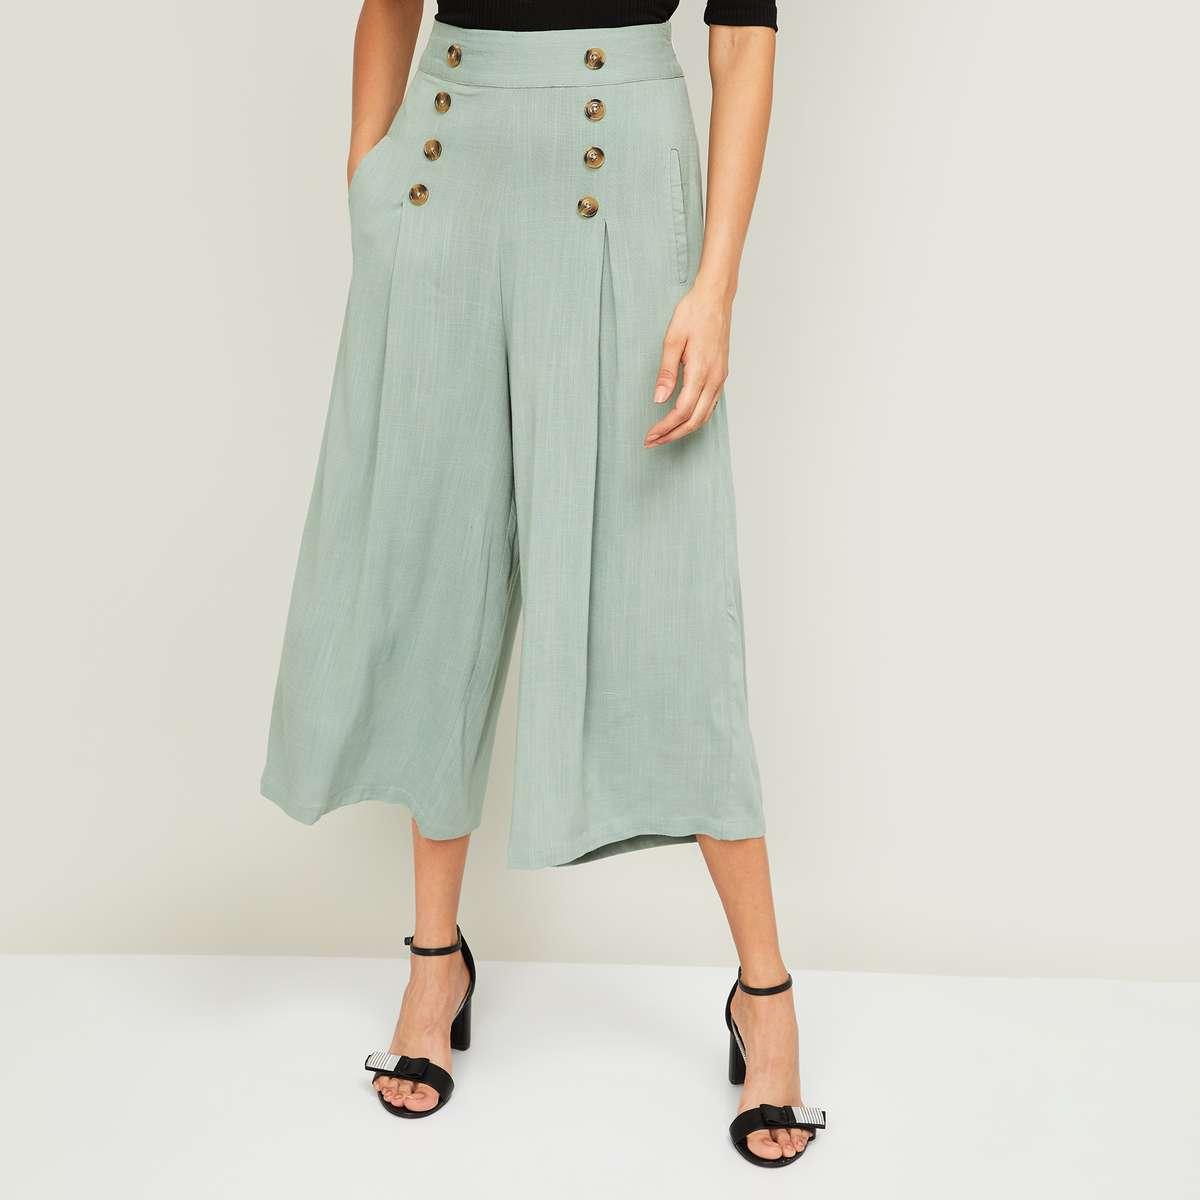 8.CODE Women Solid Elasticated Culottes